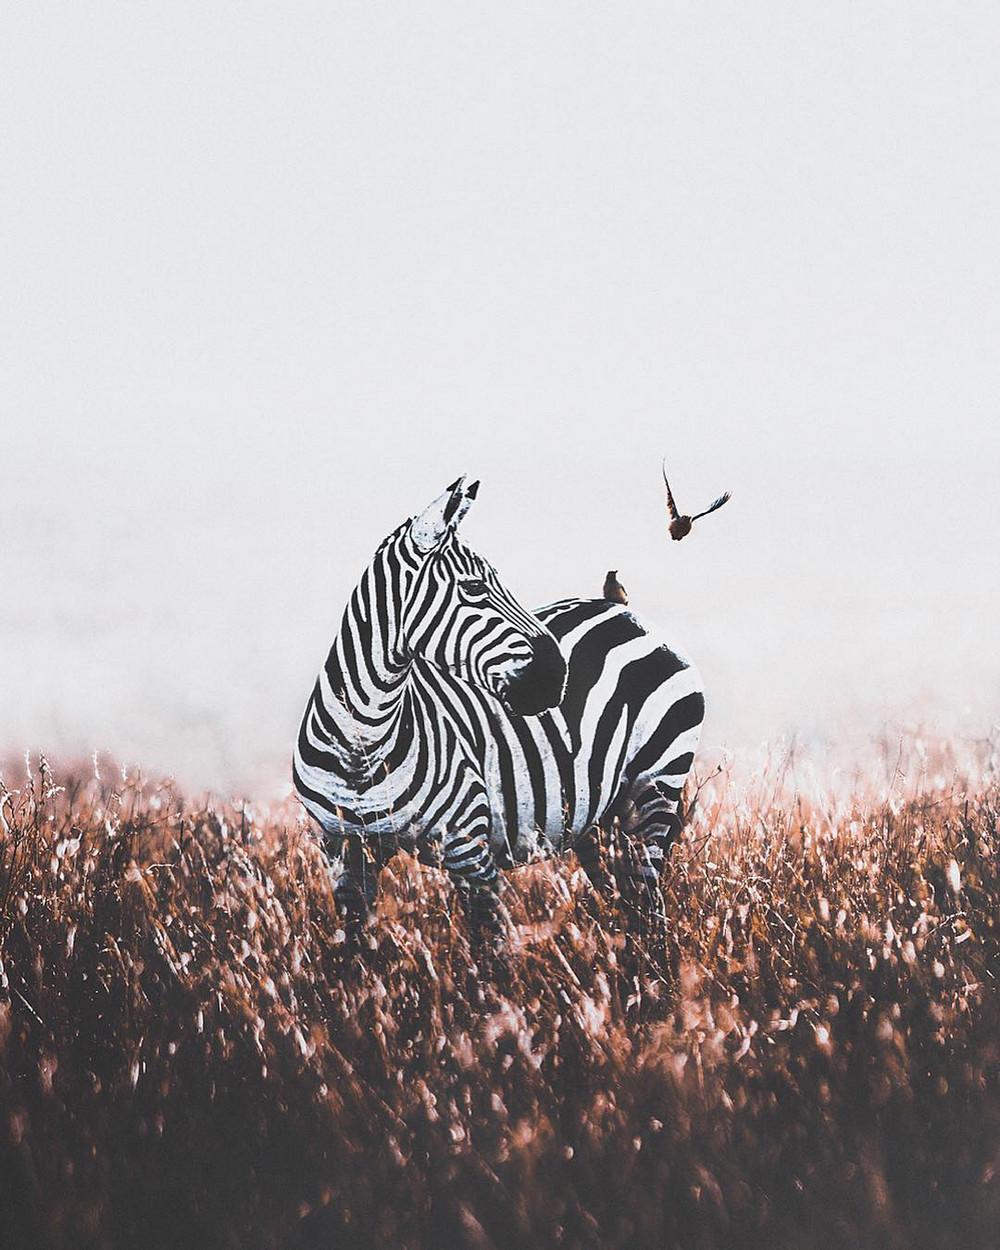 Природа в объективе фотографа Донала Бойда (Donal Boyd)